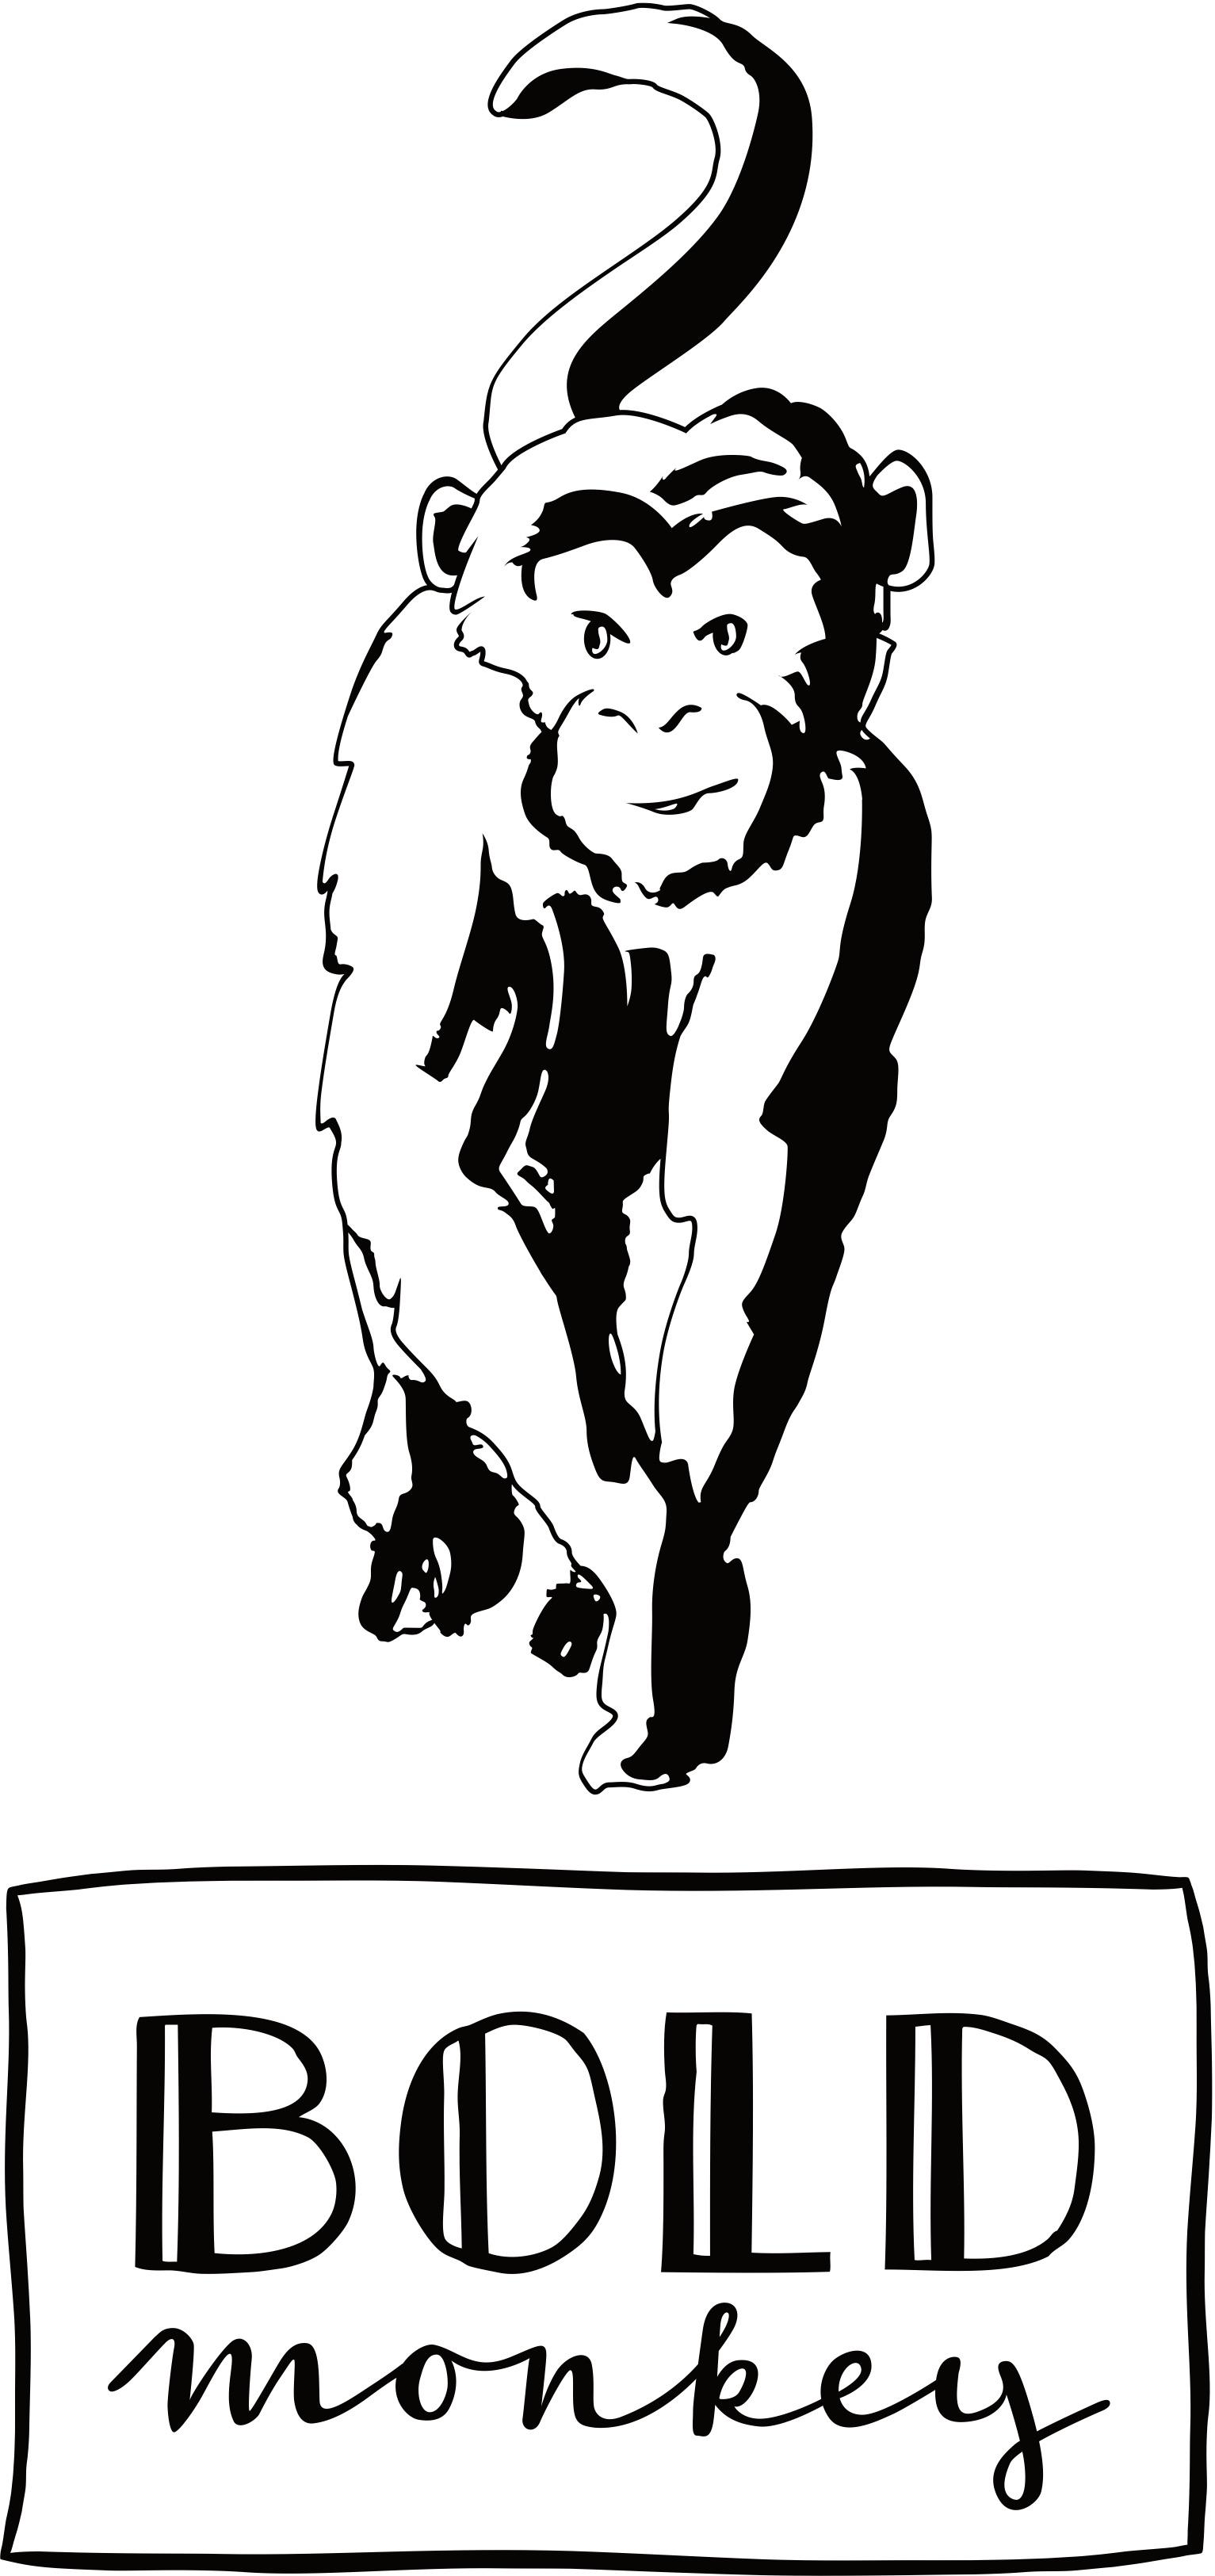 Bold Monkey You're So Ugly grote ronde spiegel L large oranje glas diameter ⌀ ø 61 cm